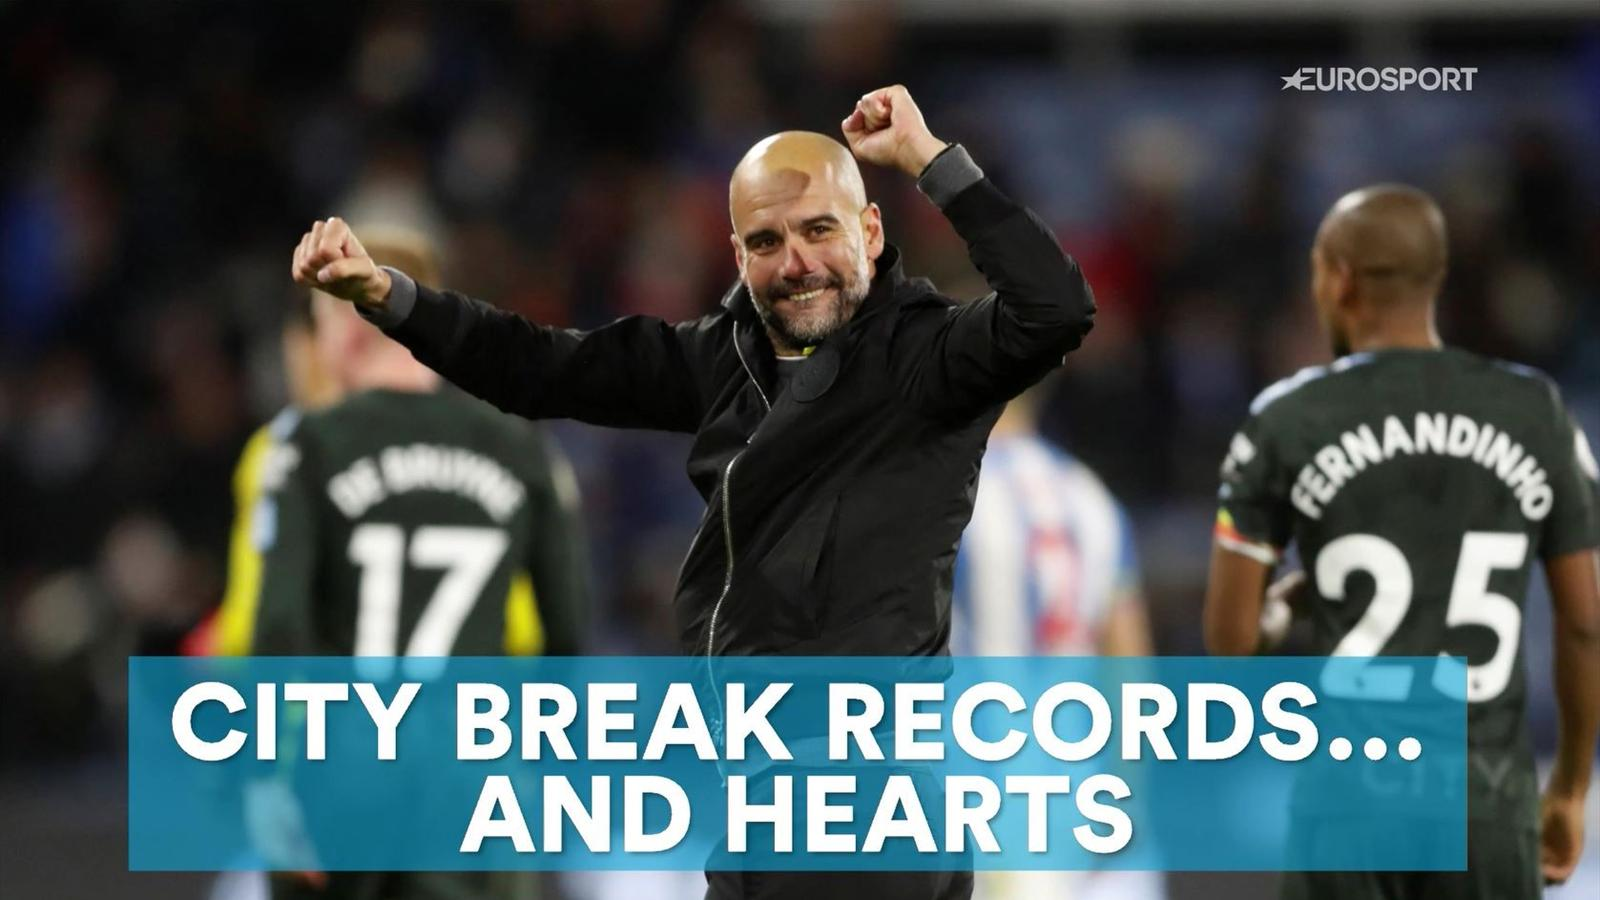 records break by messina - photo#22